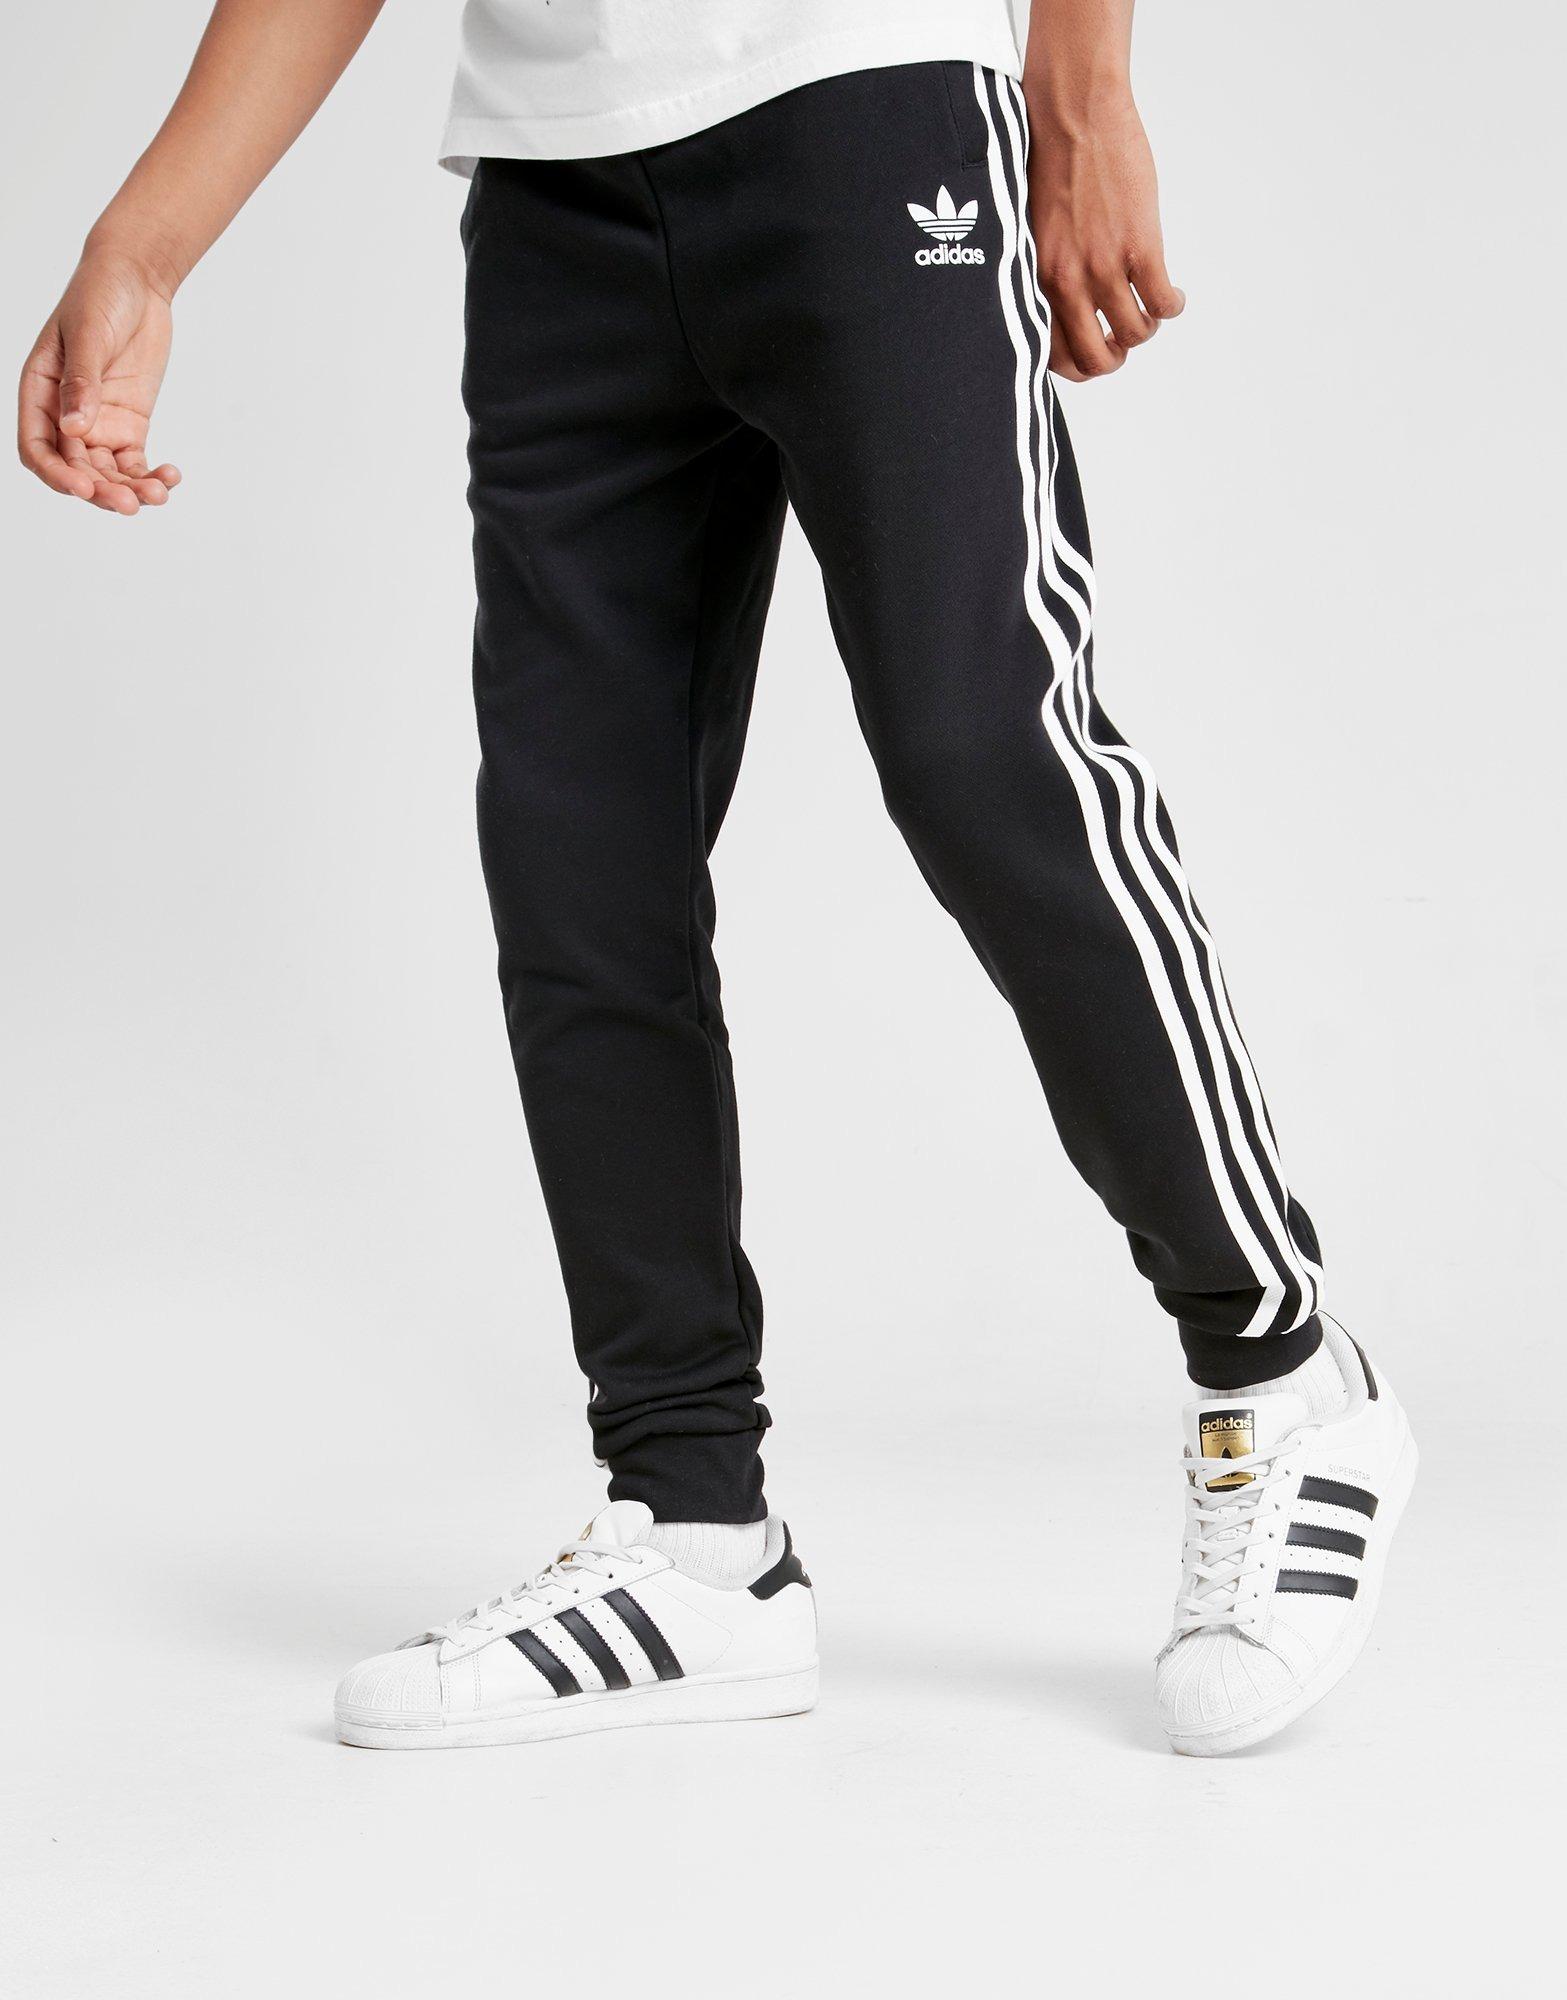 adidas Originals Pantalon de survêtement Polaire 3 Stripes Junior | JD Sports